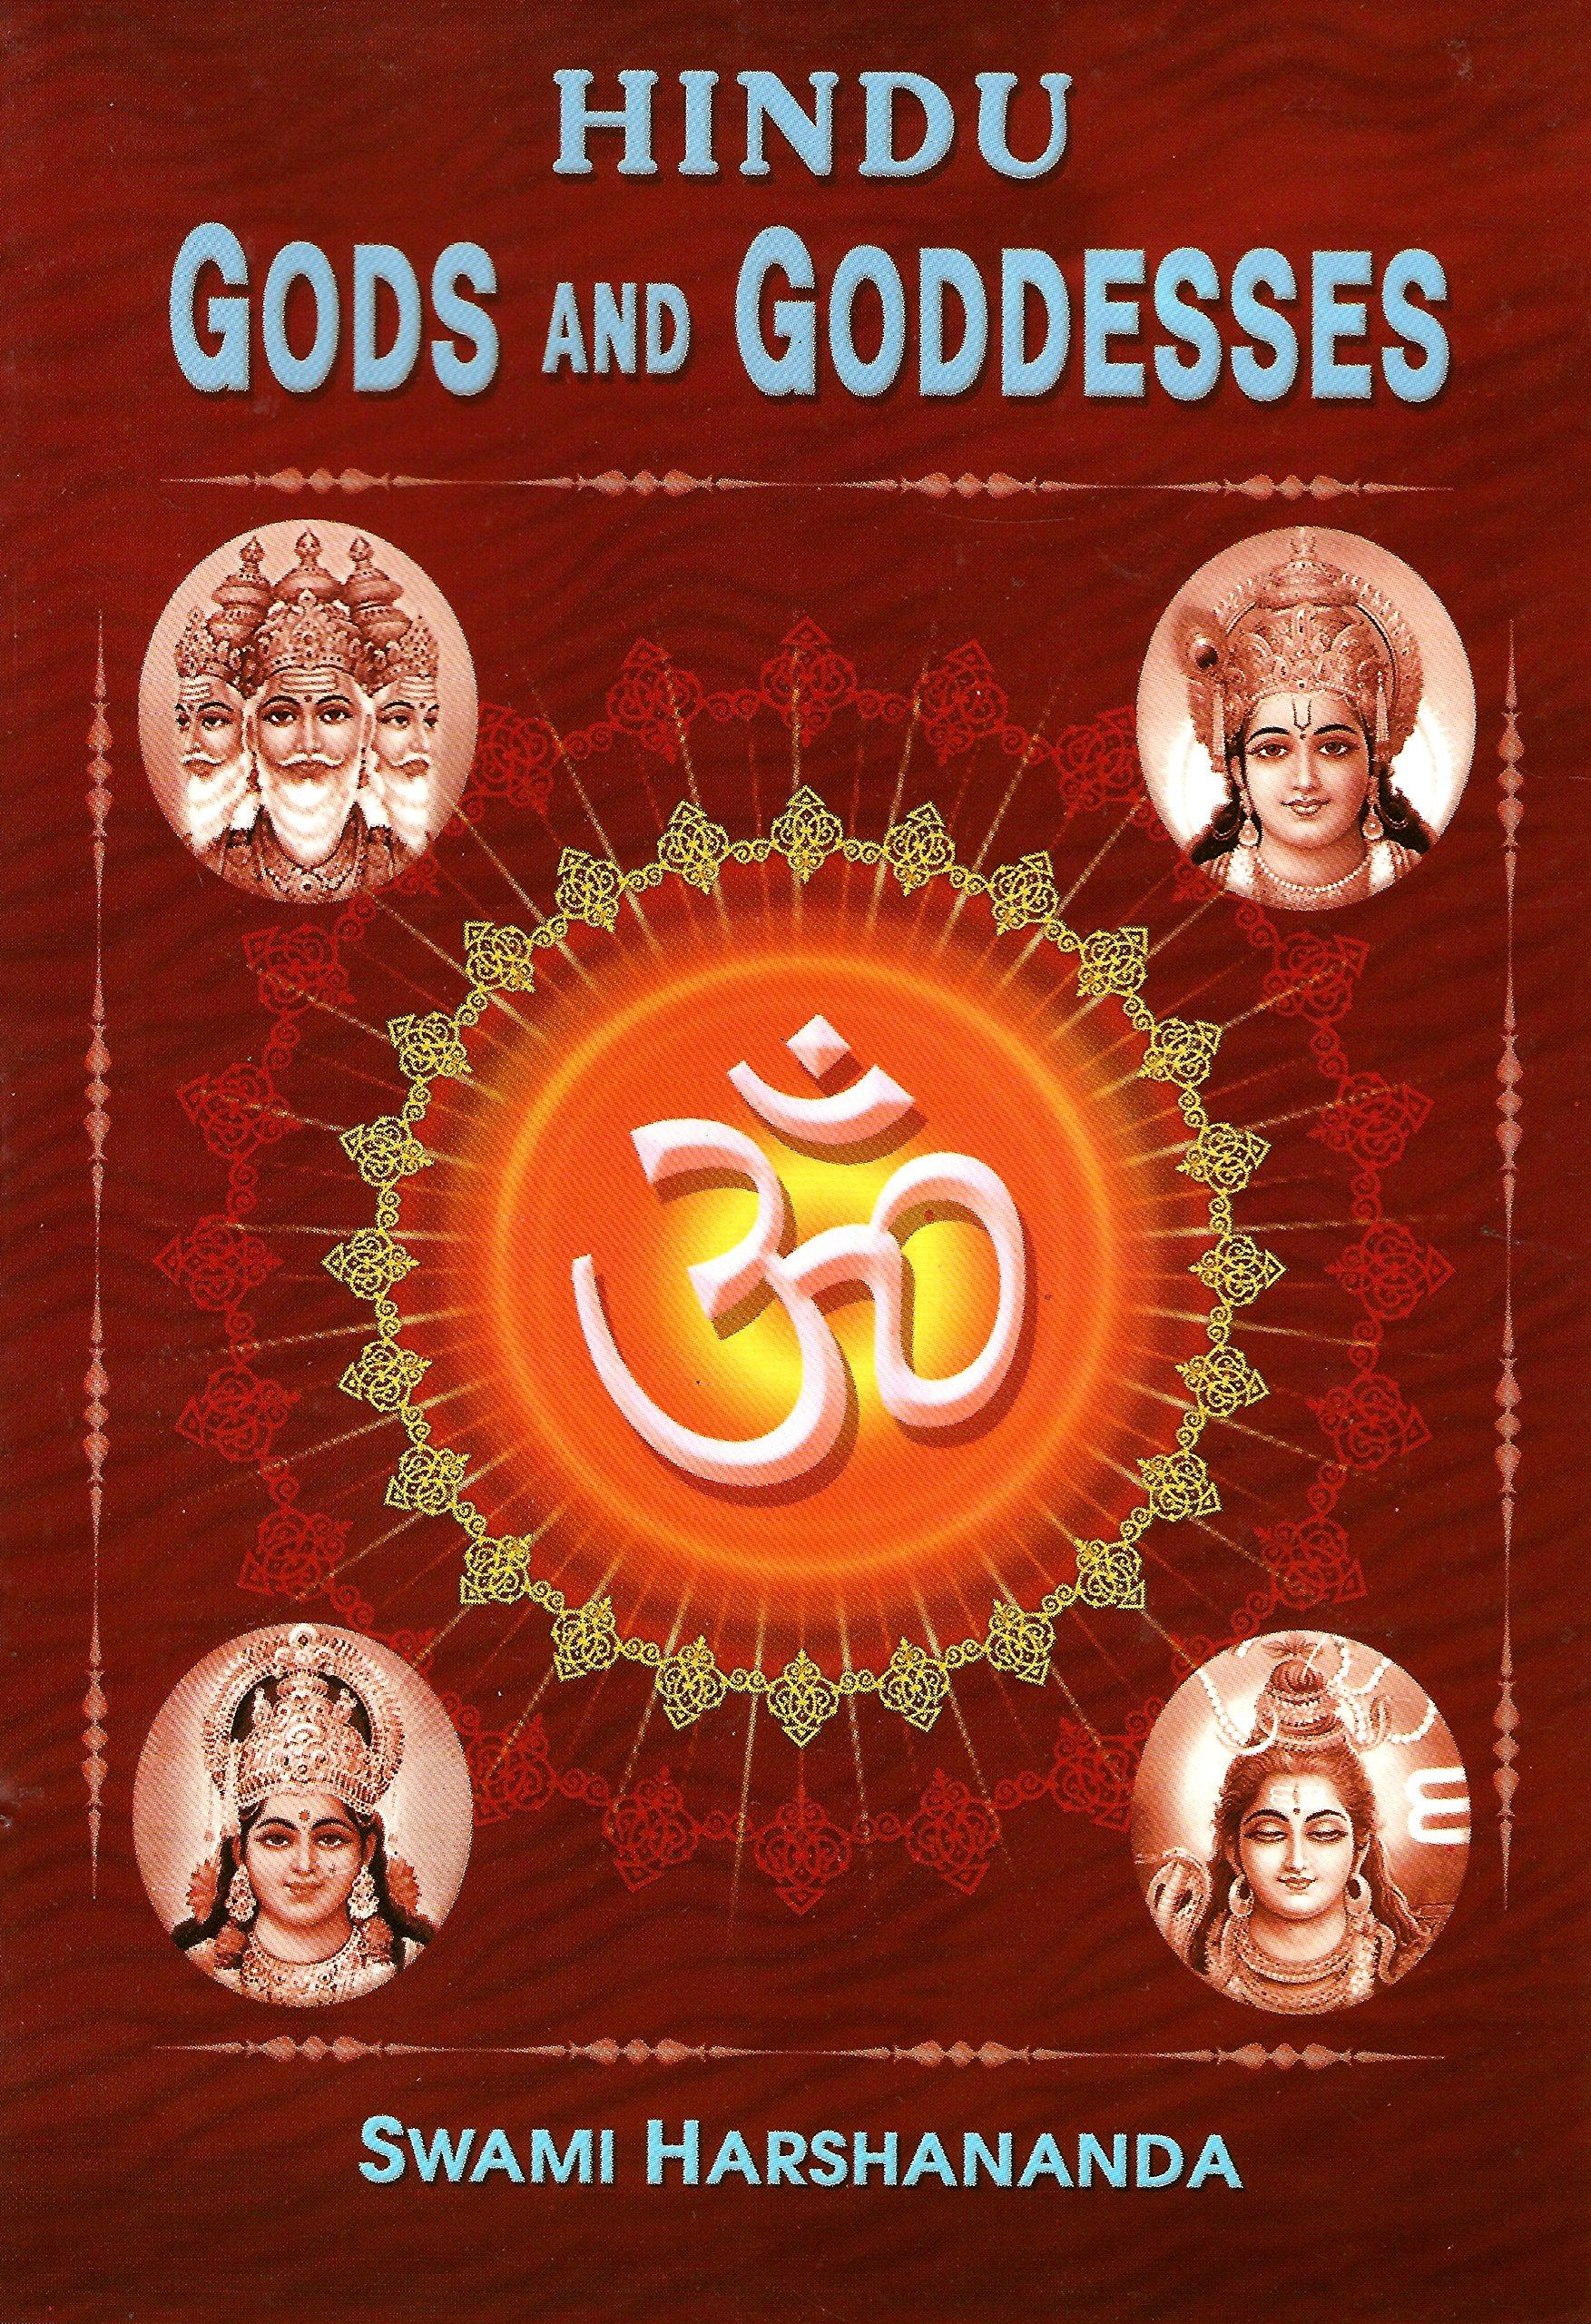 Hindu Gods and Goddesses: Swami Harshananda, M T V  Acharya